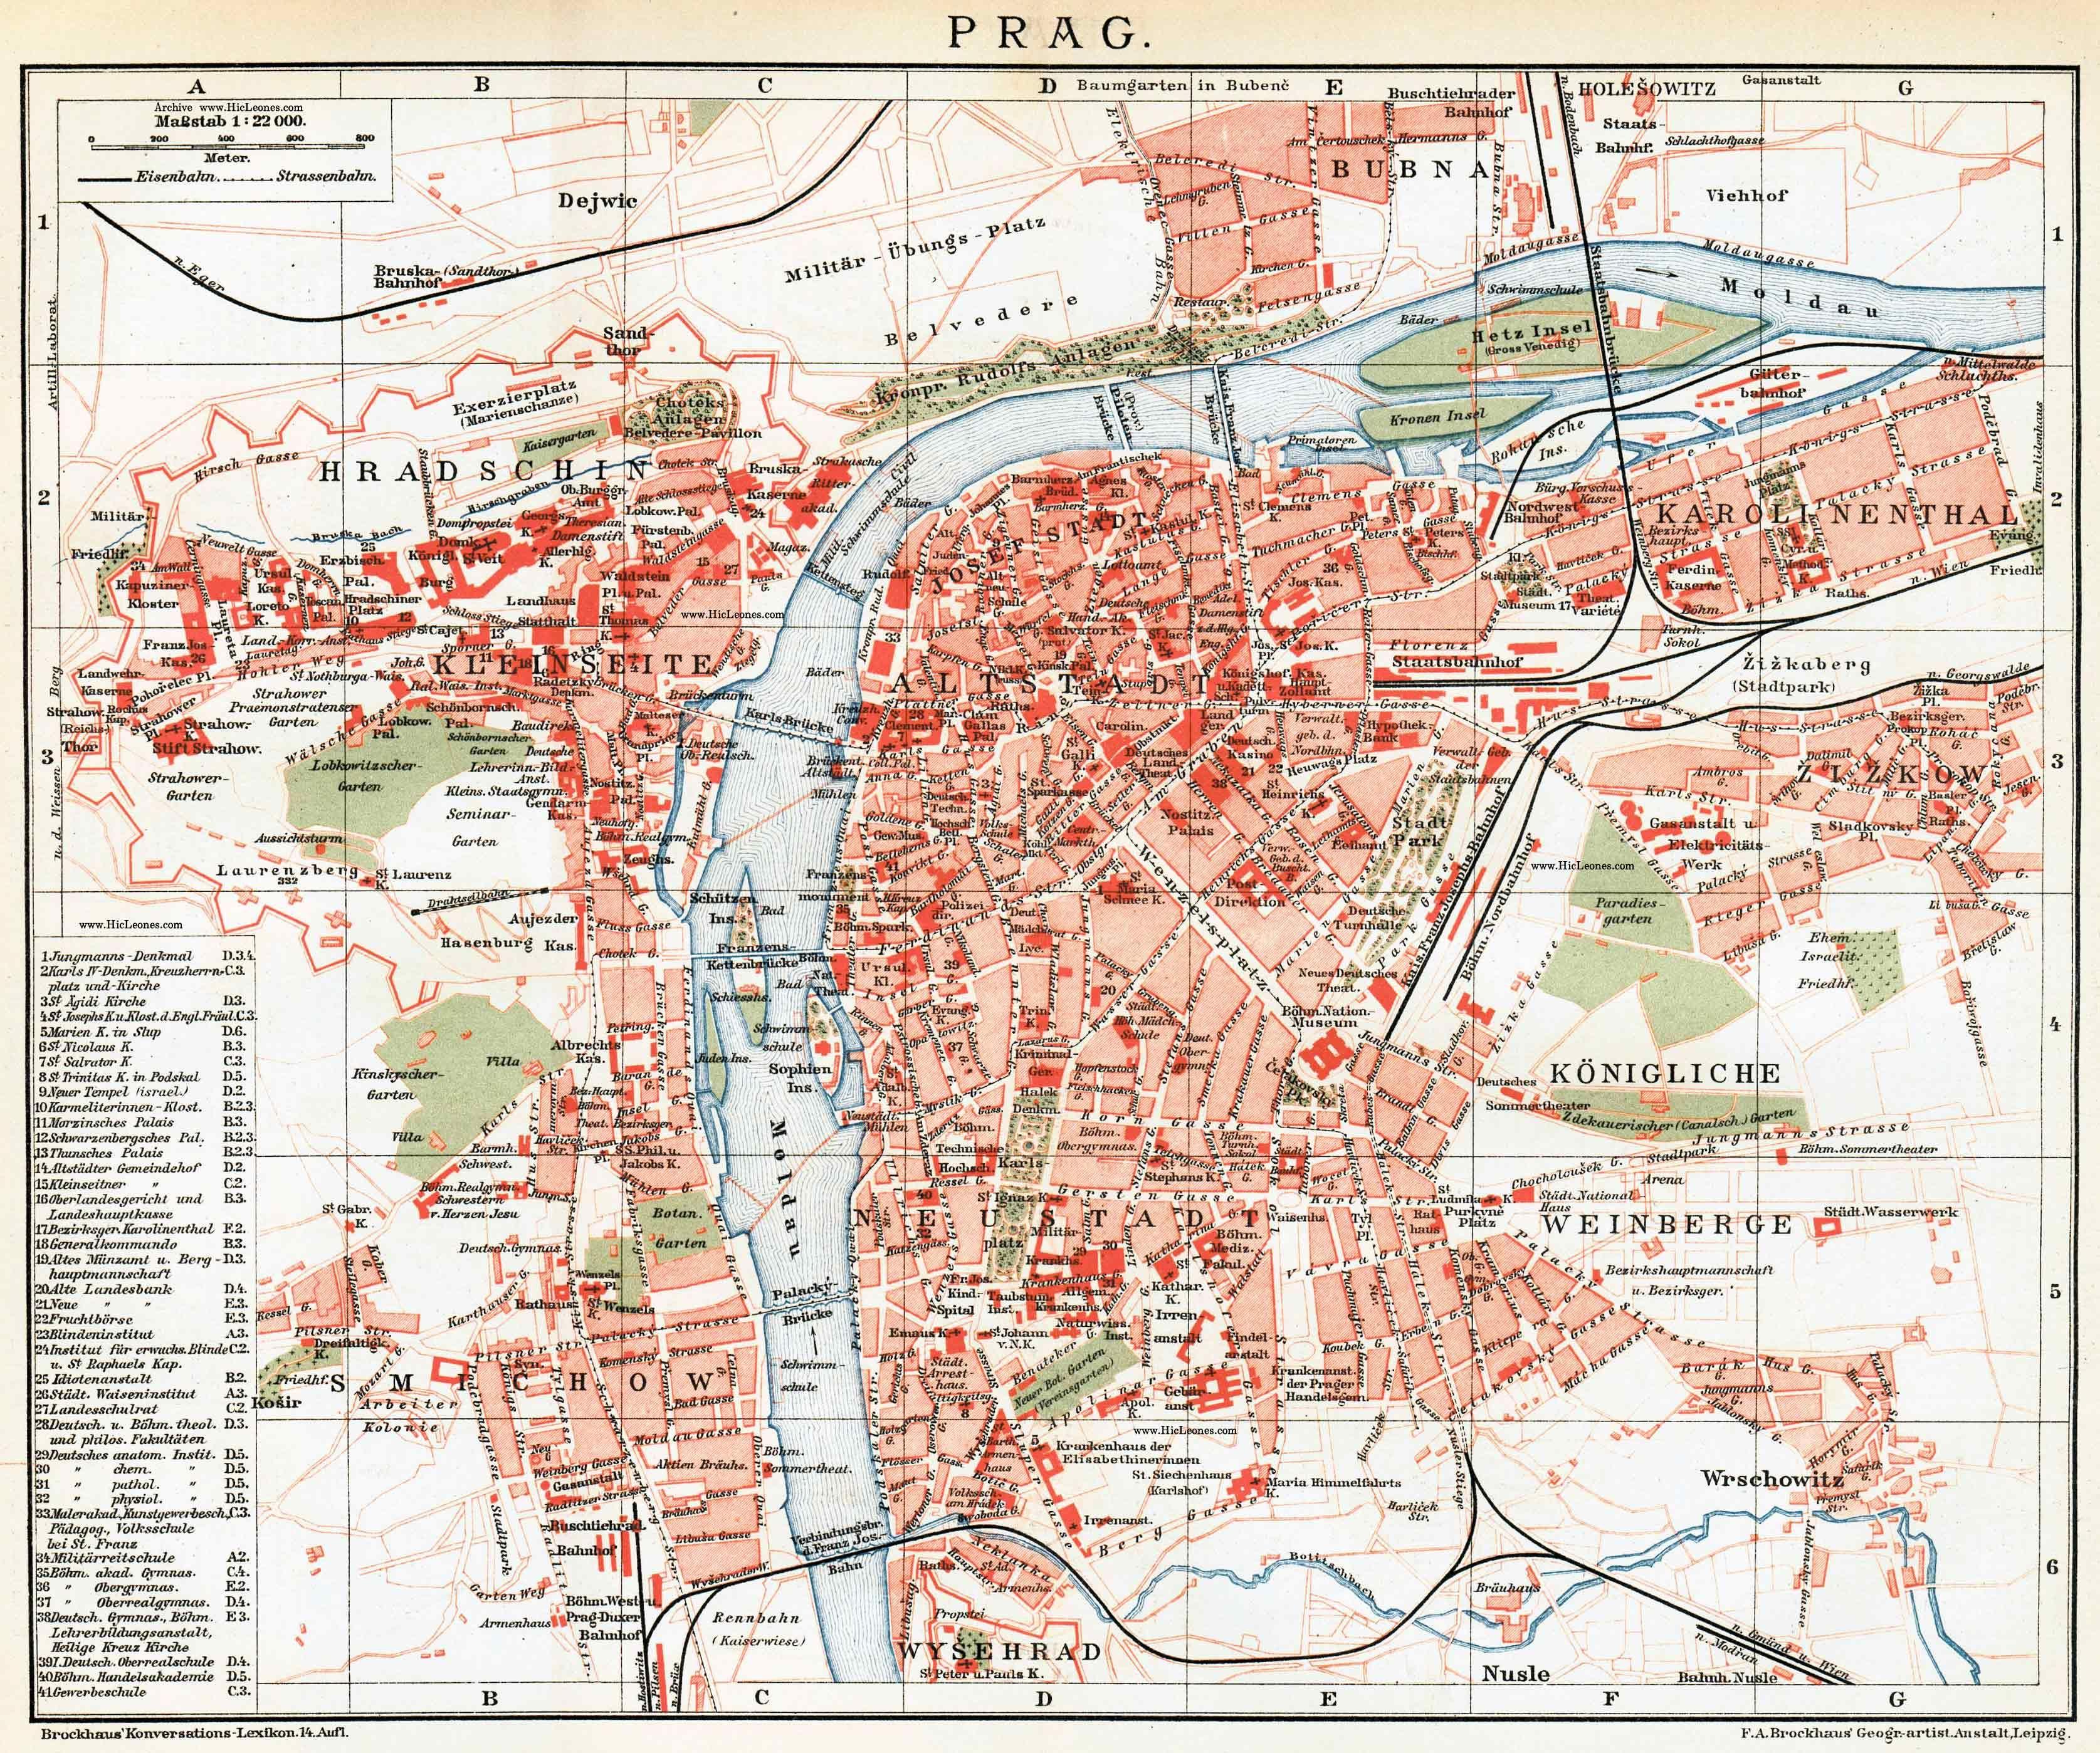 Free Maps Of Europe Print Stuff Prague Antique Maps City Maps